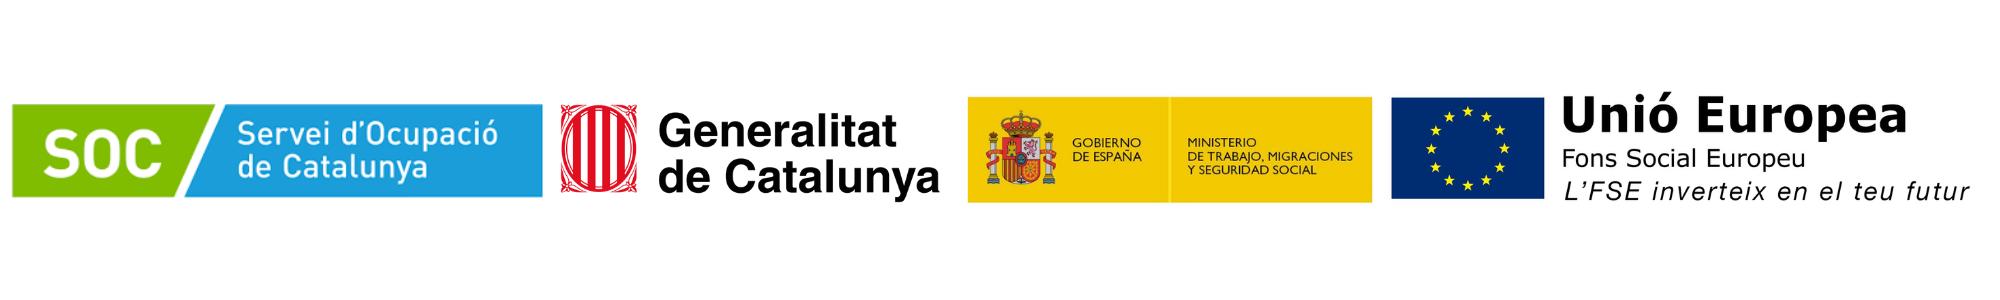 LOGOS SOC GENERALITAT MINISTERI FONS EUROPEU.png